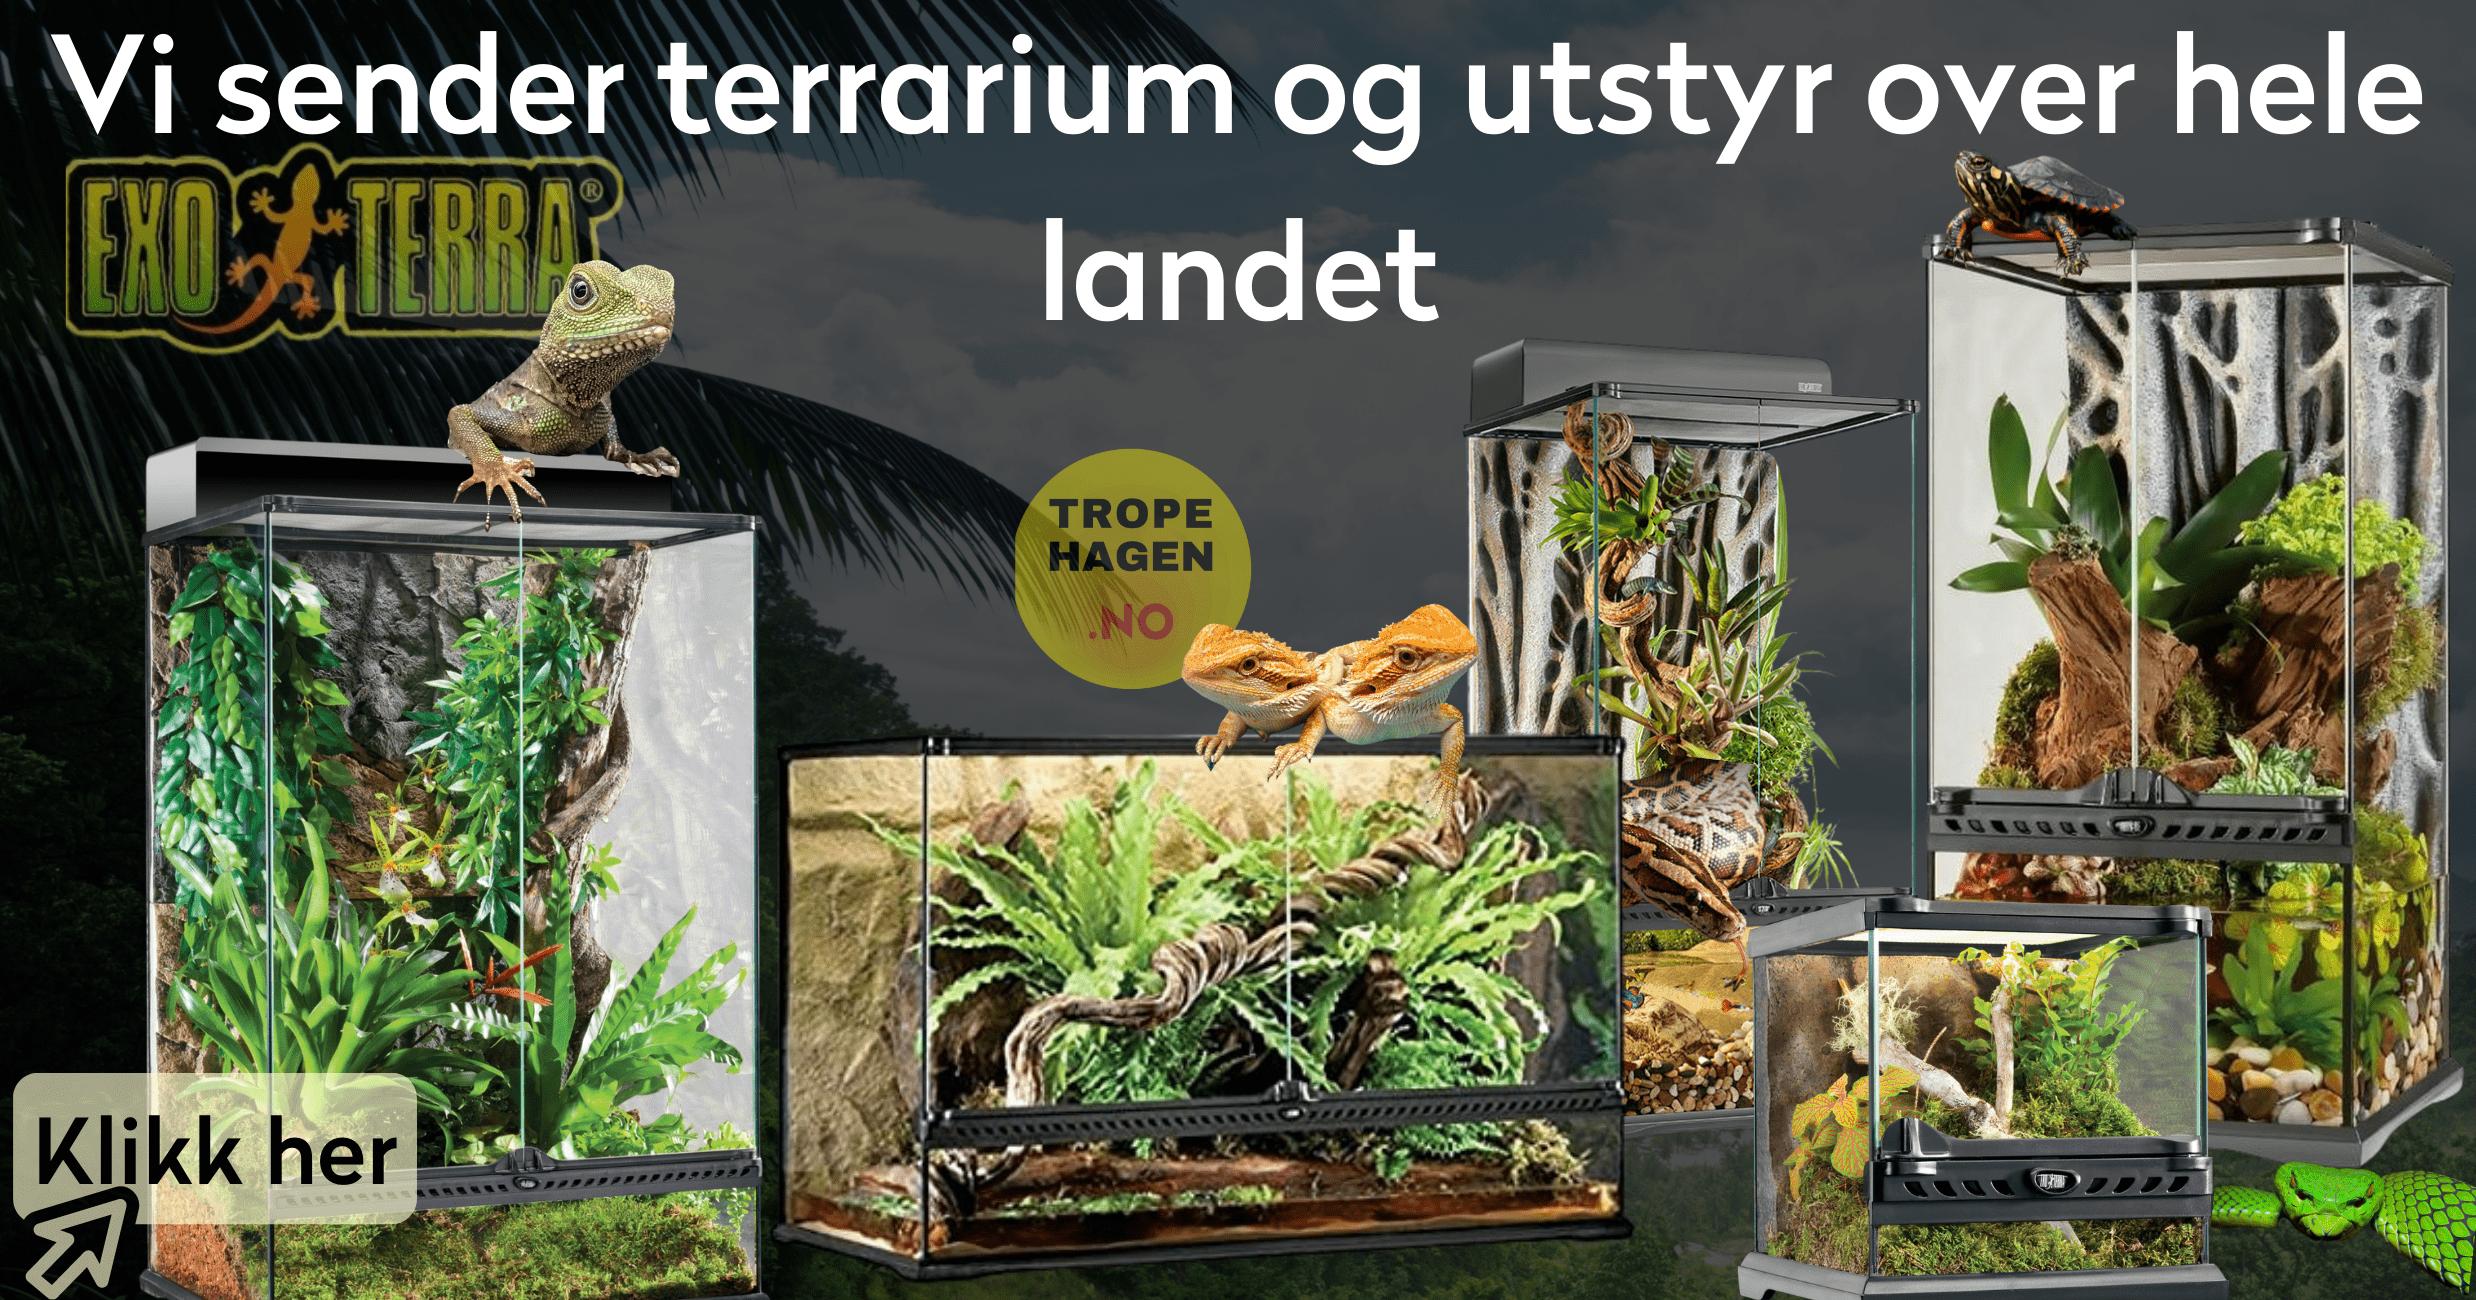 Tropehagen Terrarium